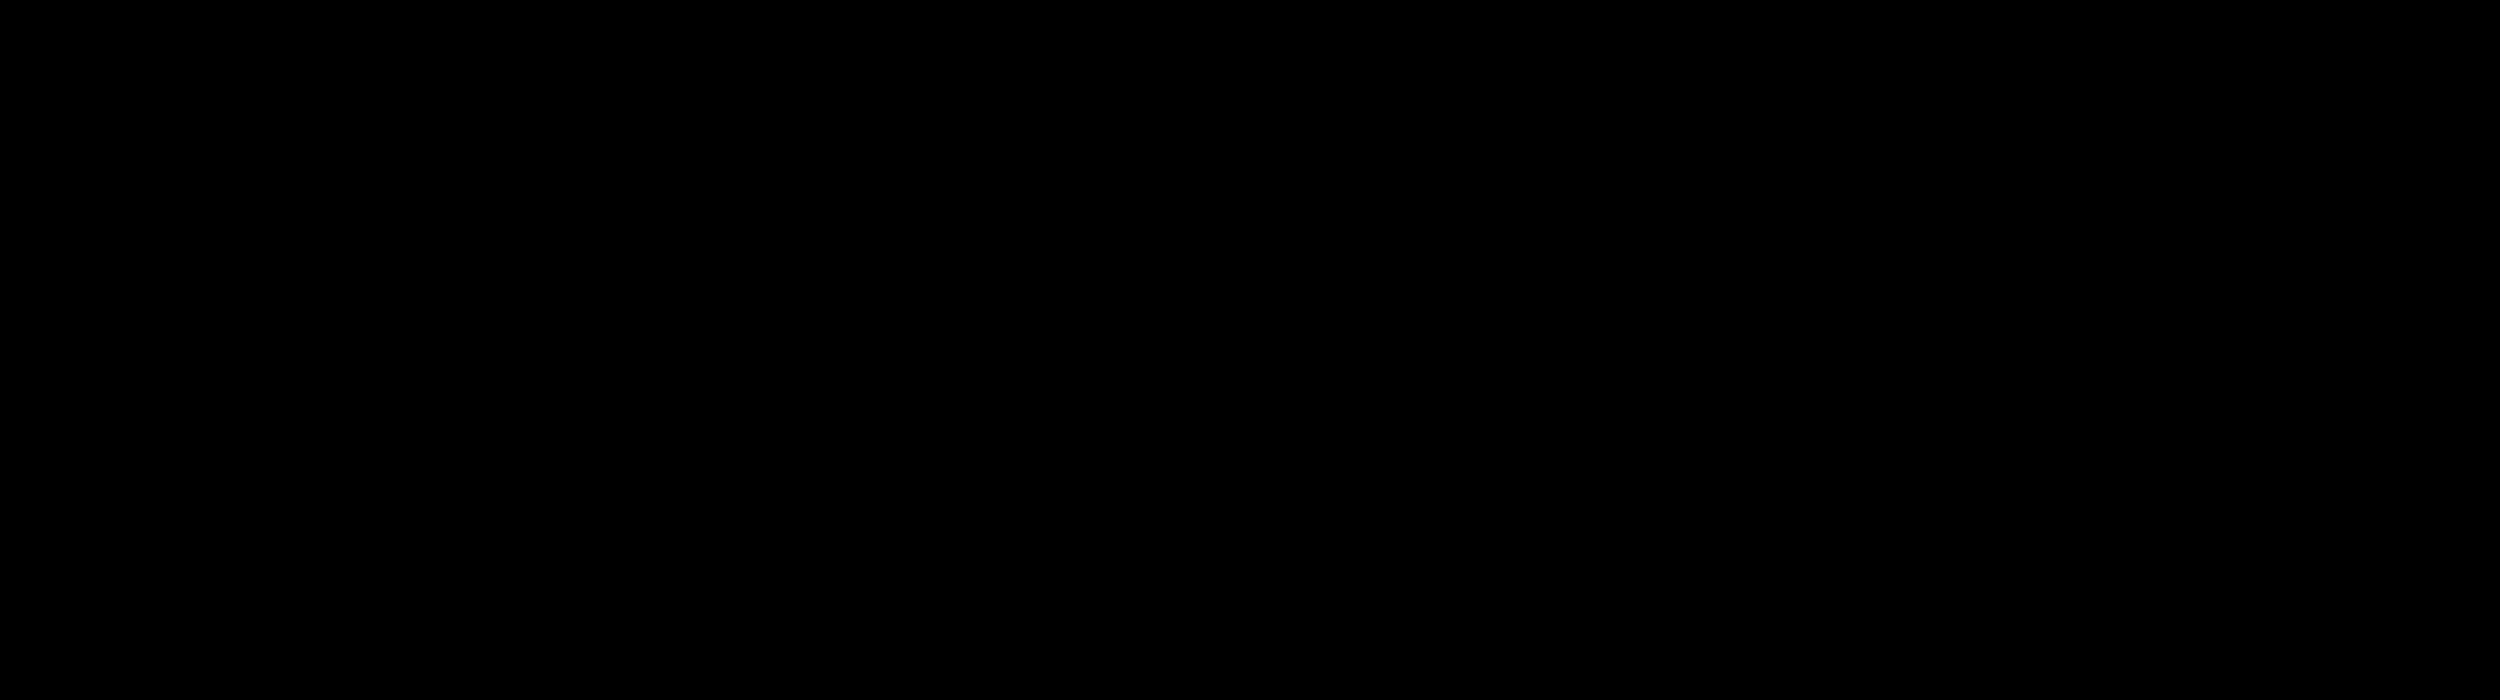 Roam And Recon Logo